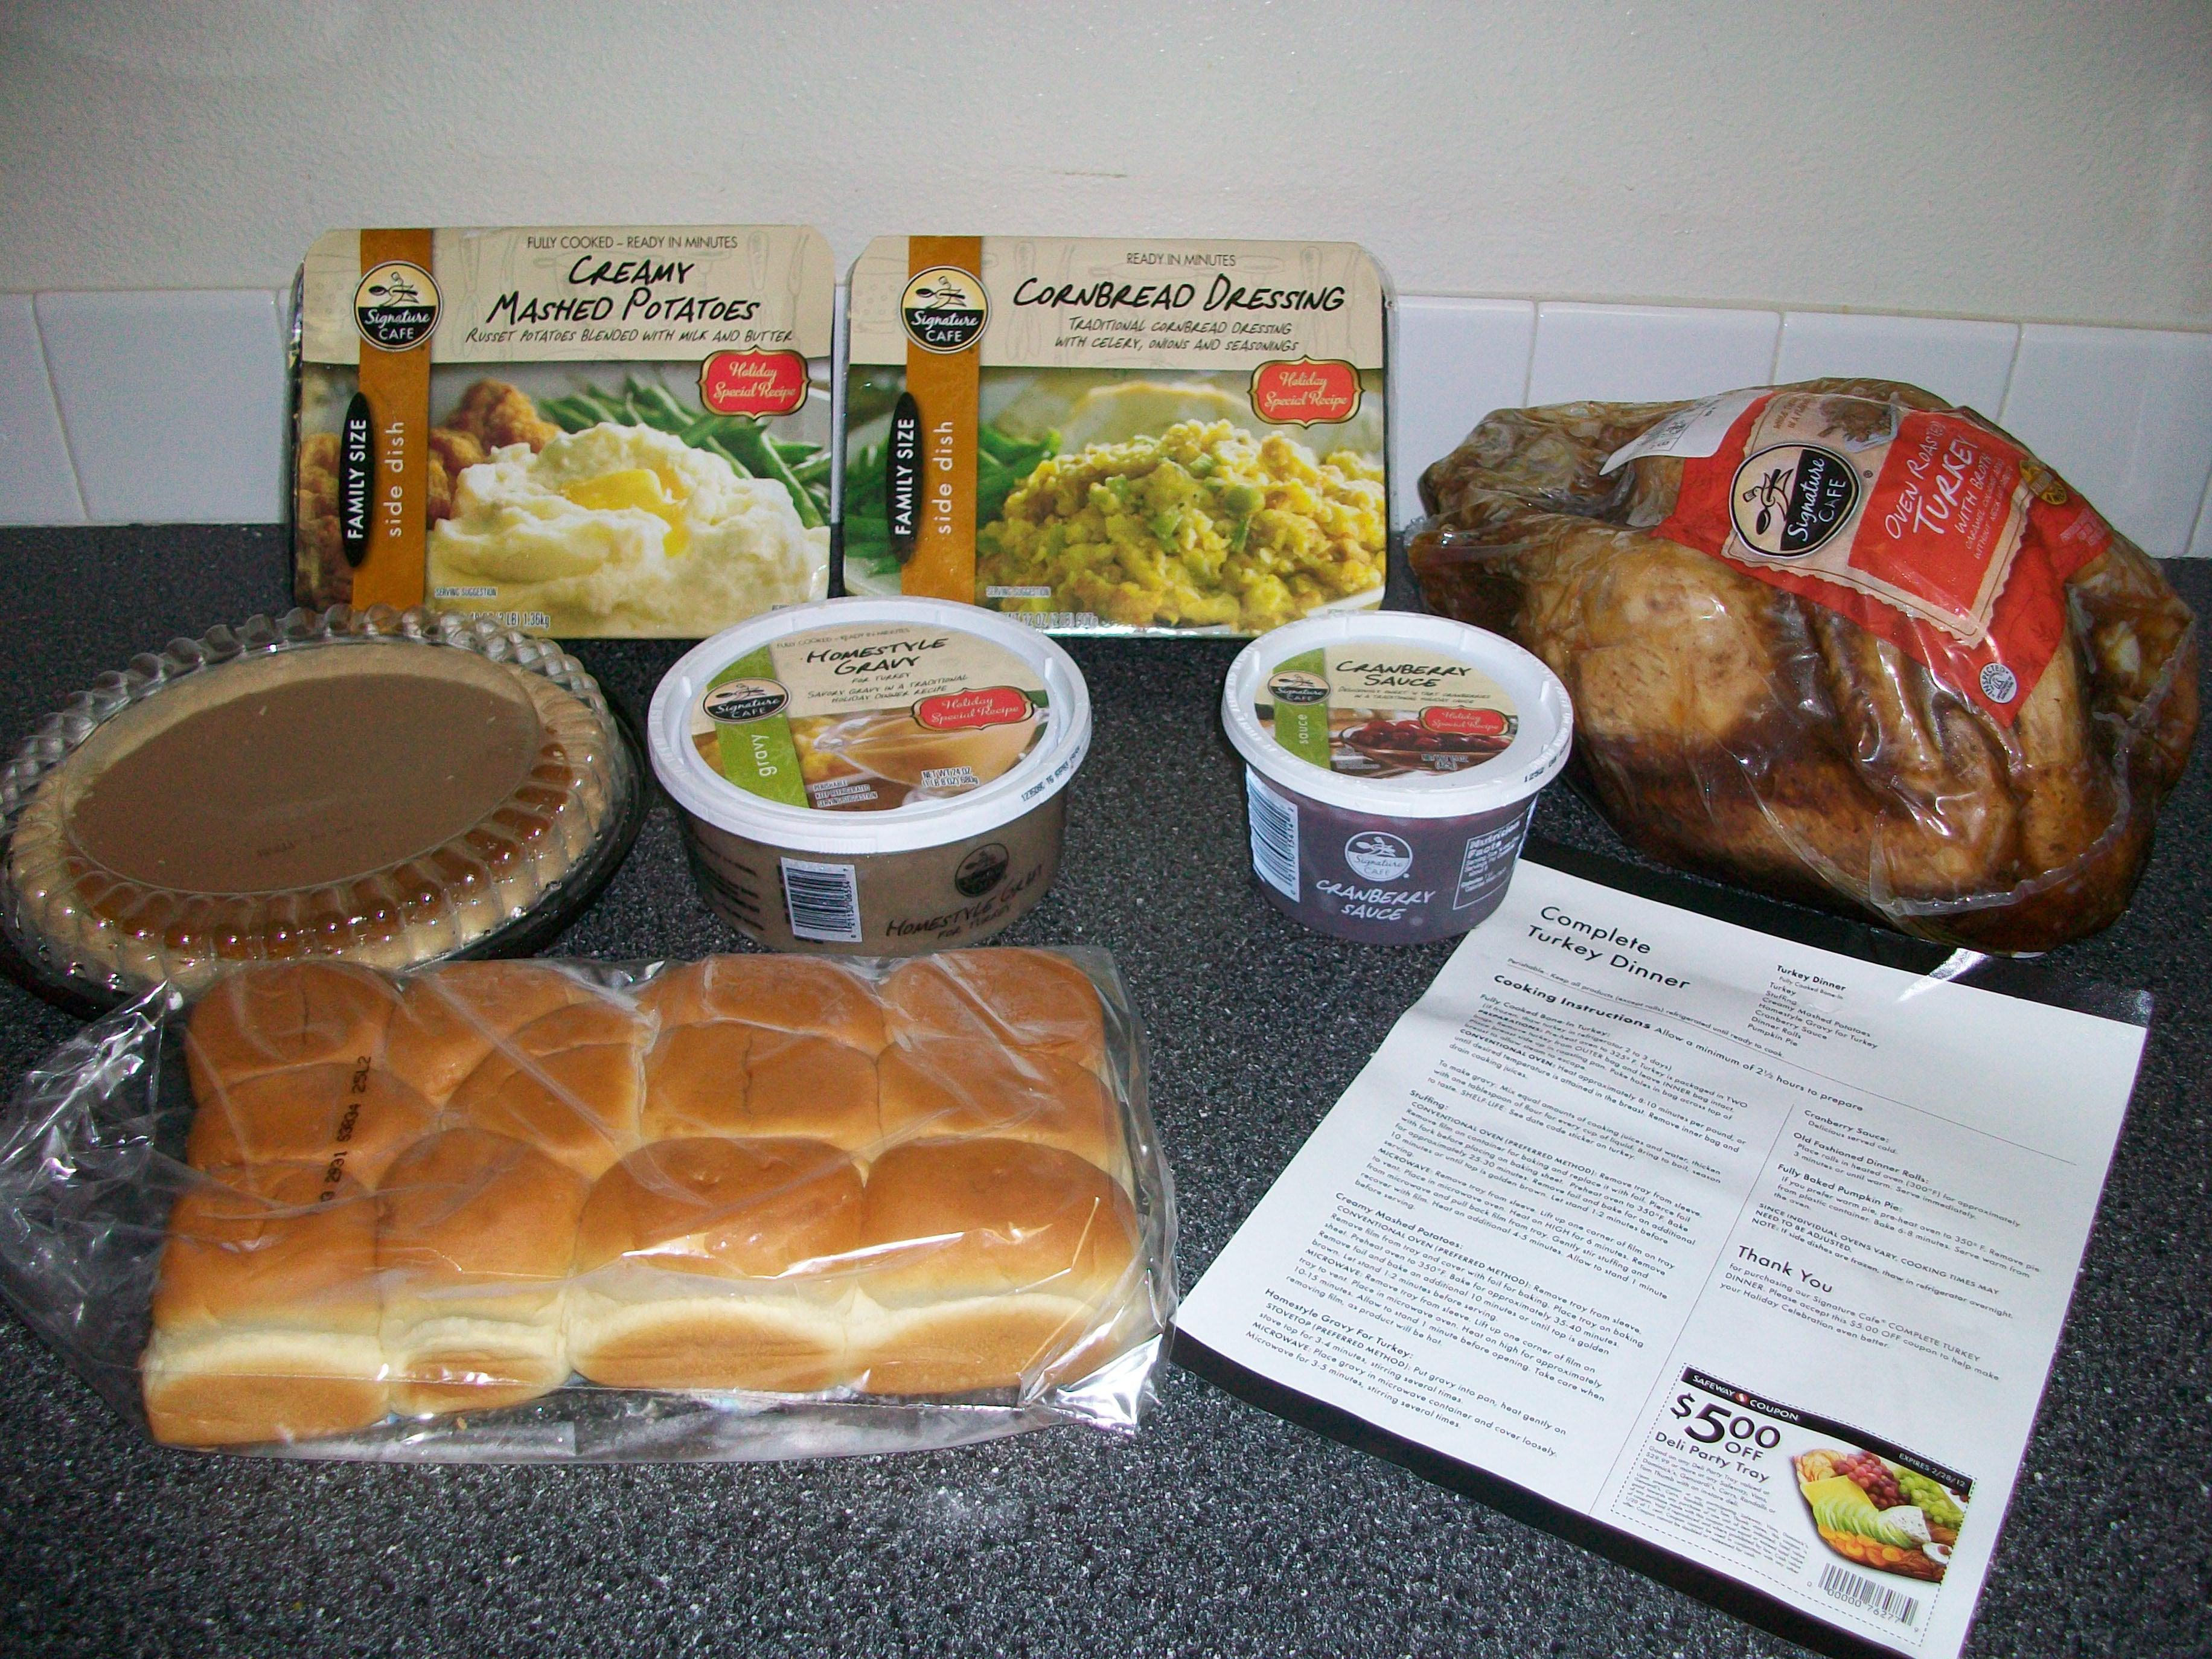 Precooked Thanksgiving Dinner  Safeway $39 99 Turkey Dinner Review